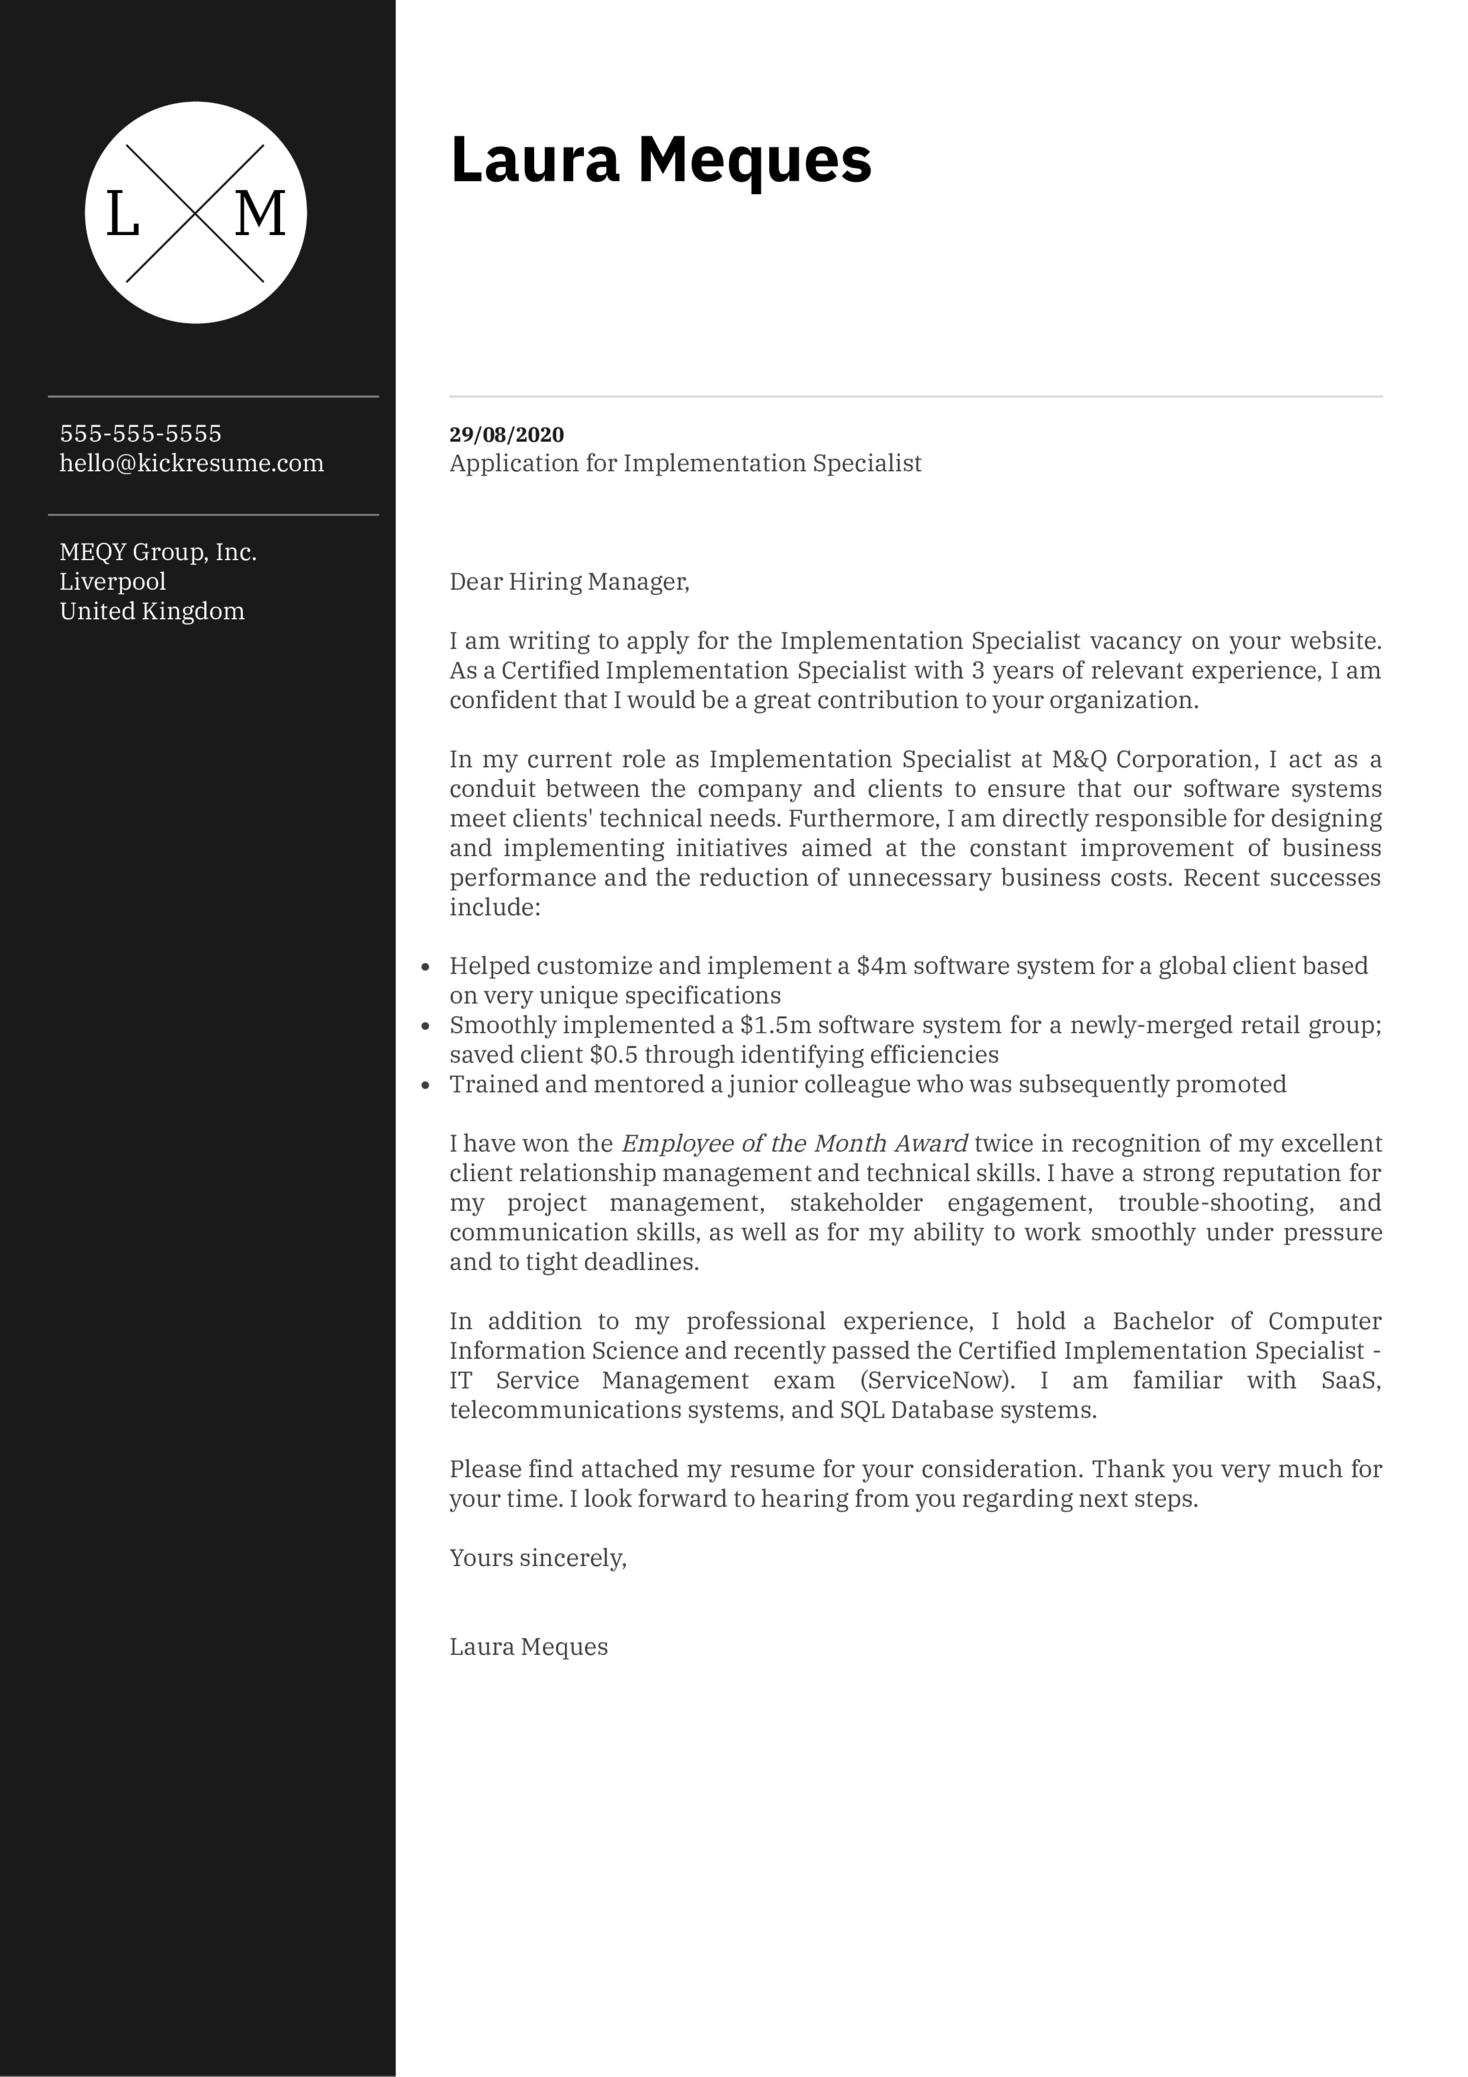 Implementation Specialist Cover Letter Sample